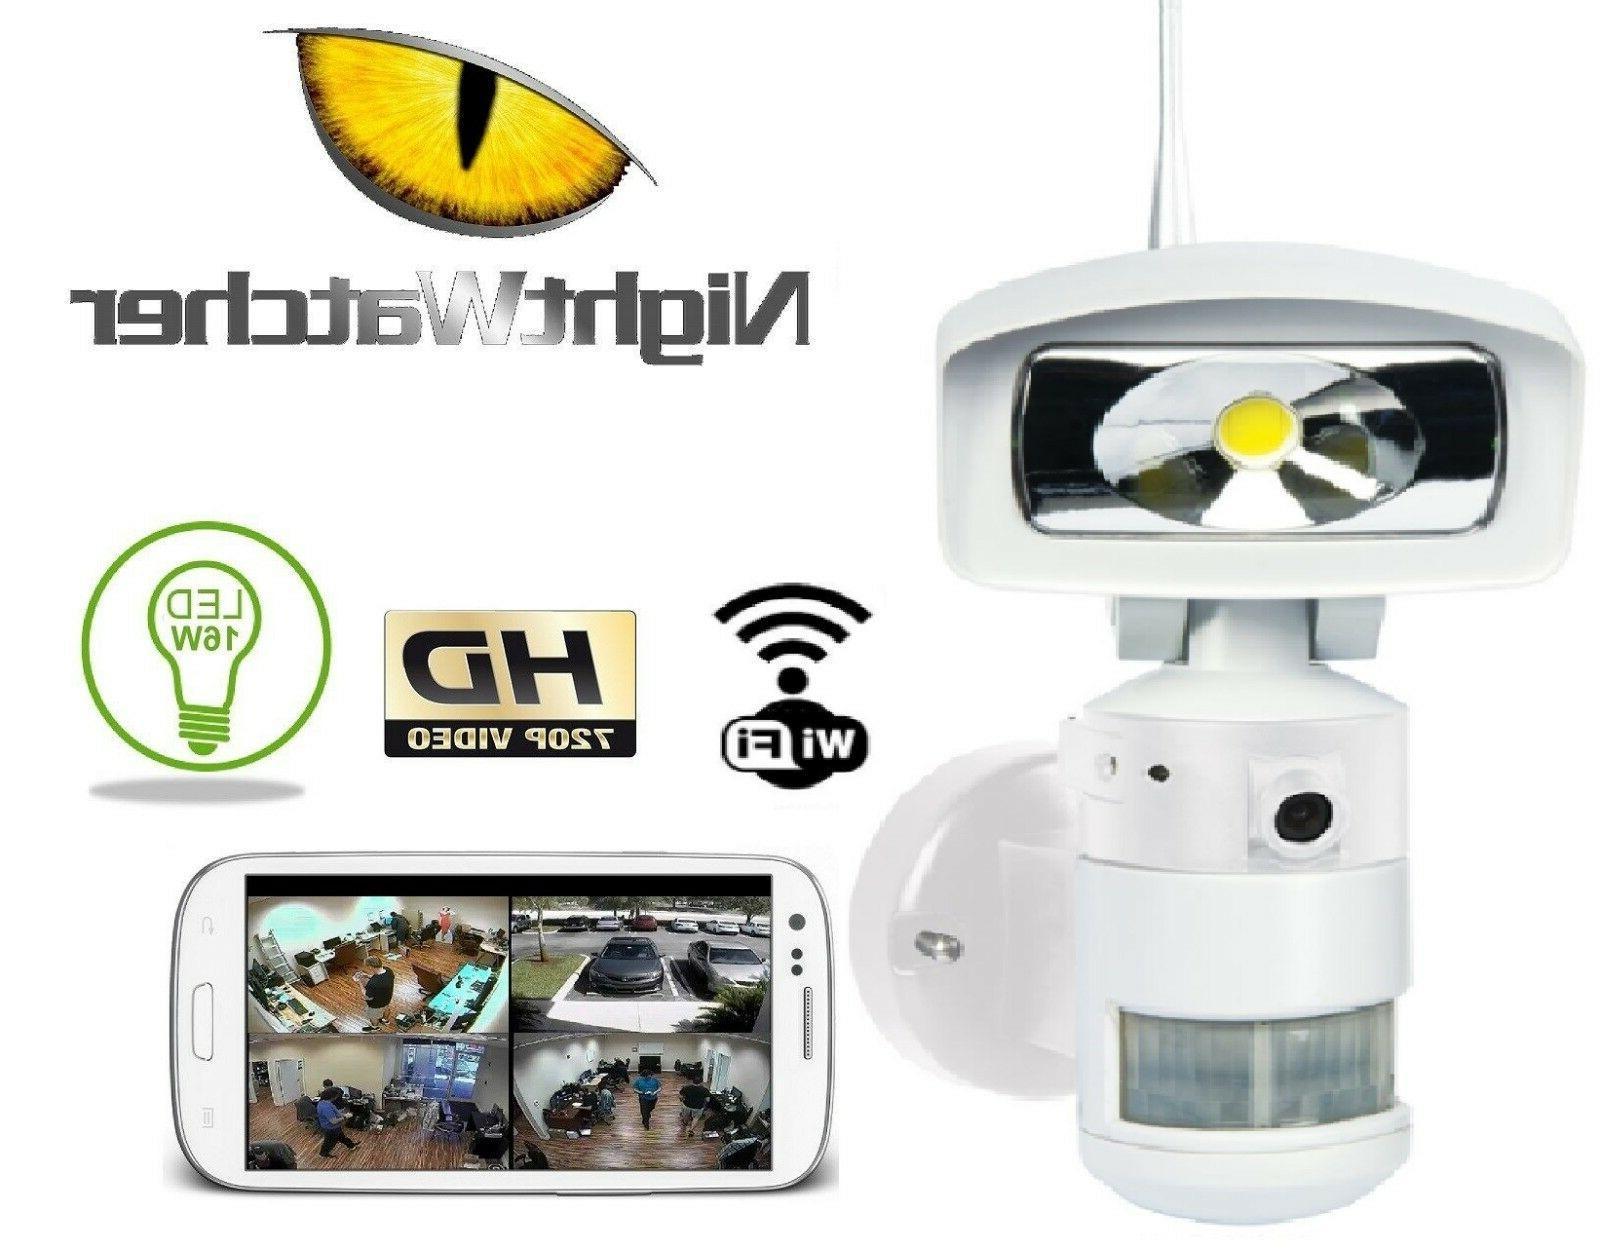 FLOOD LIGHT CAMERA Nightwatcher Robotic LED Light HD Camera